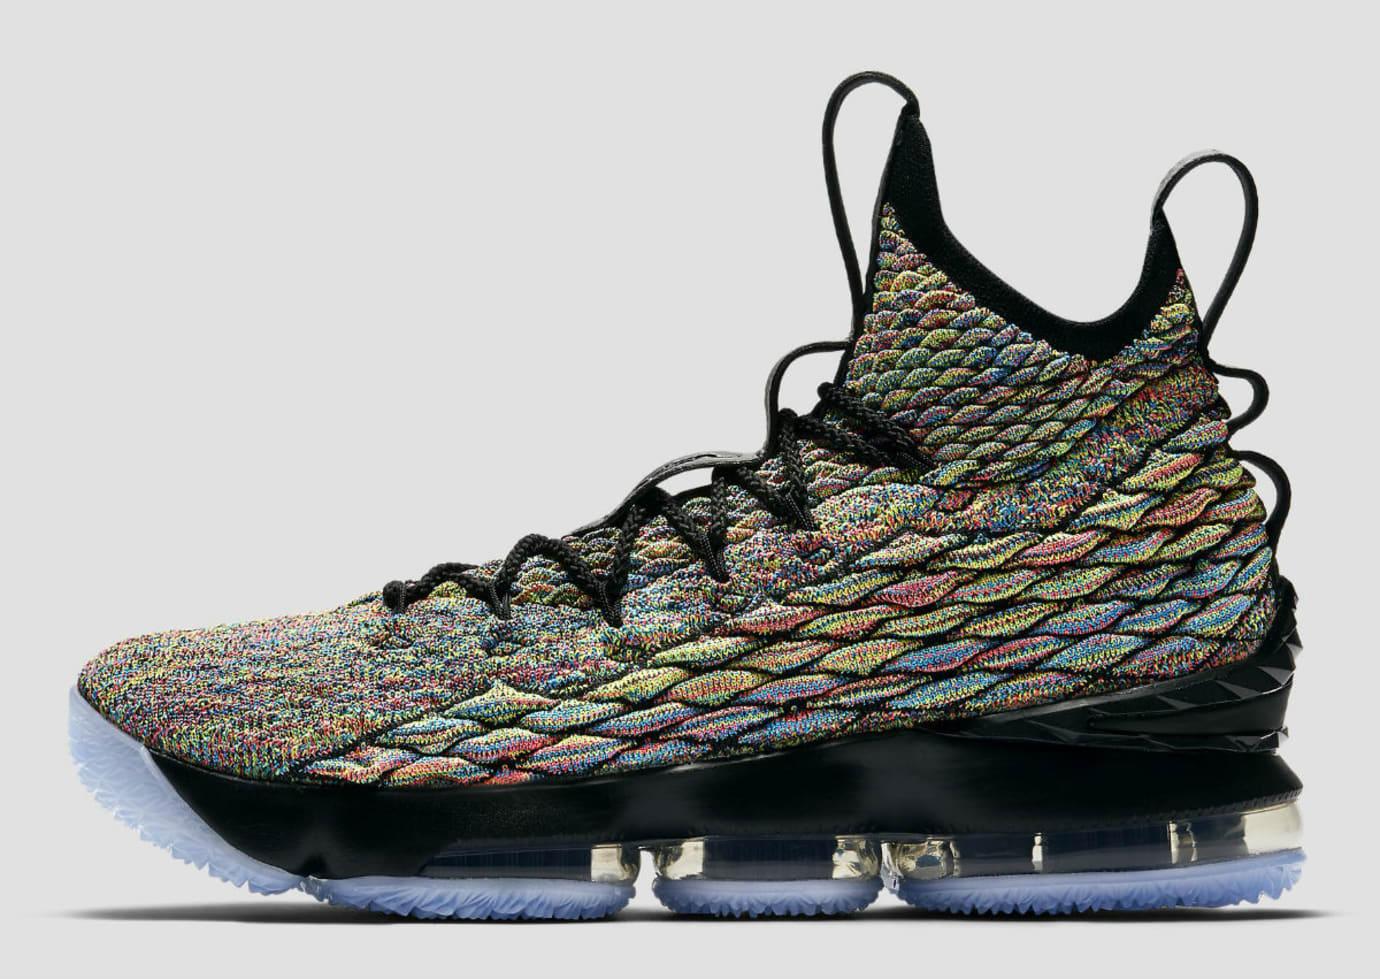 5e149aabdc5 Nike LeBron 15 XV Four Horsemen Black Fruity Pebbles Release Date  897648-901 Profile